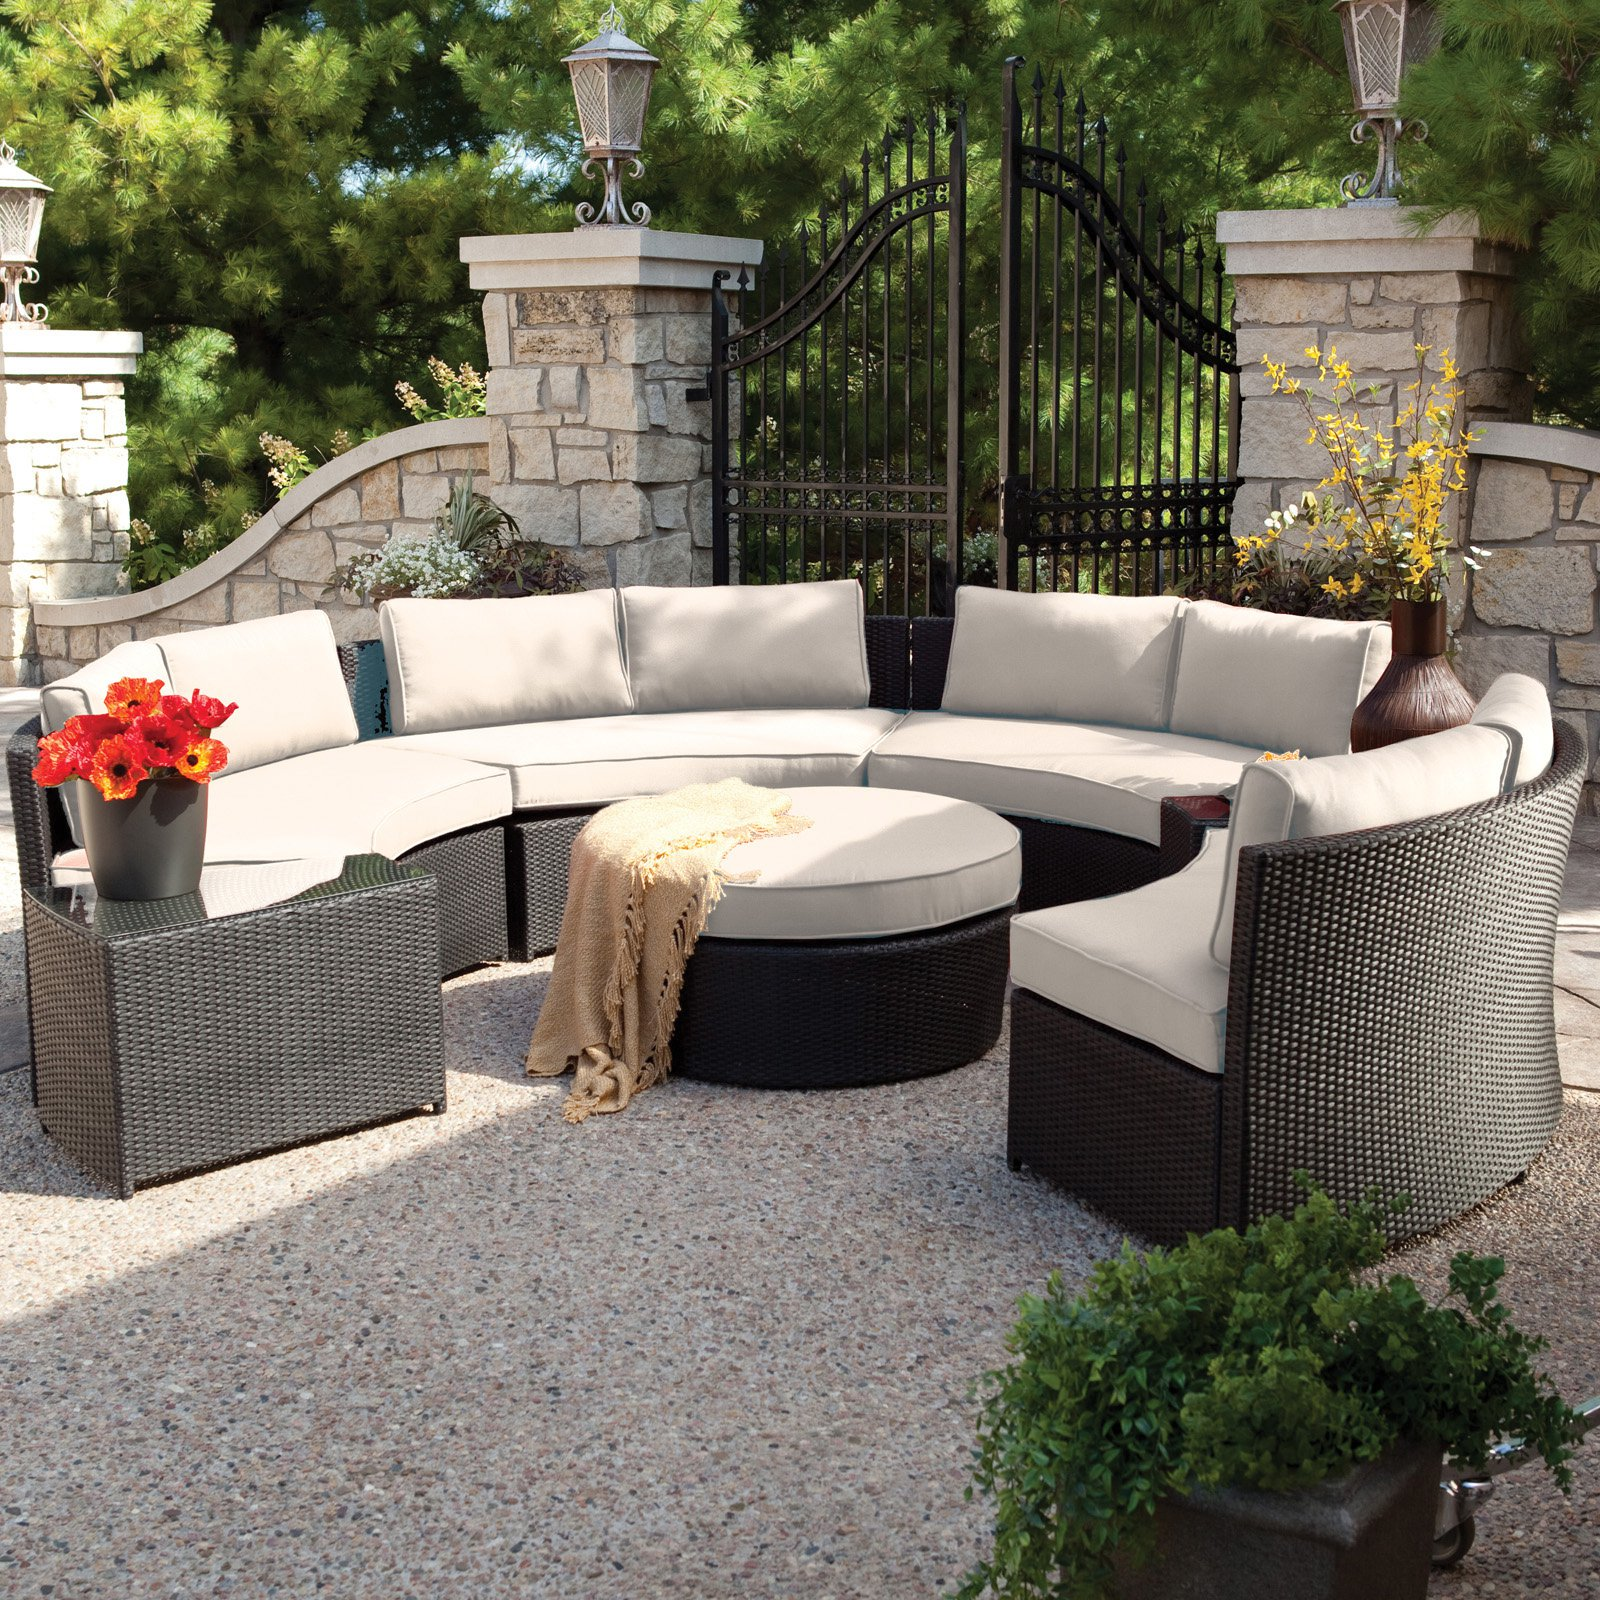 patio furniture sets belham living meridian round outdoor wicker patio furniture set with  sunbrella YRNPULH